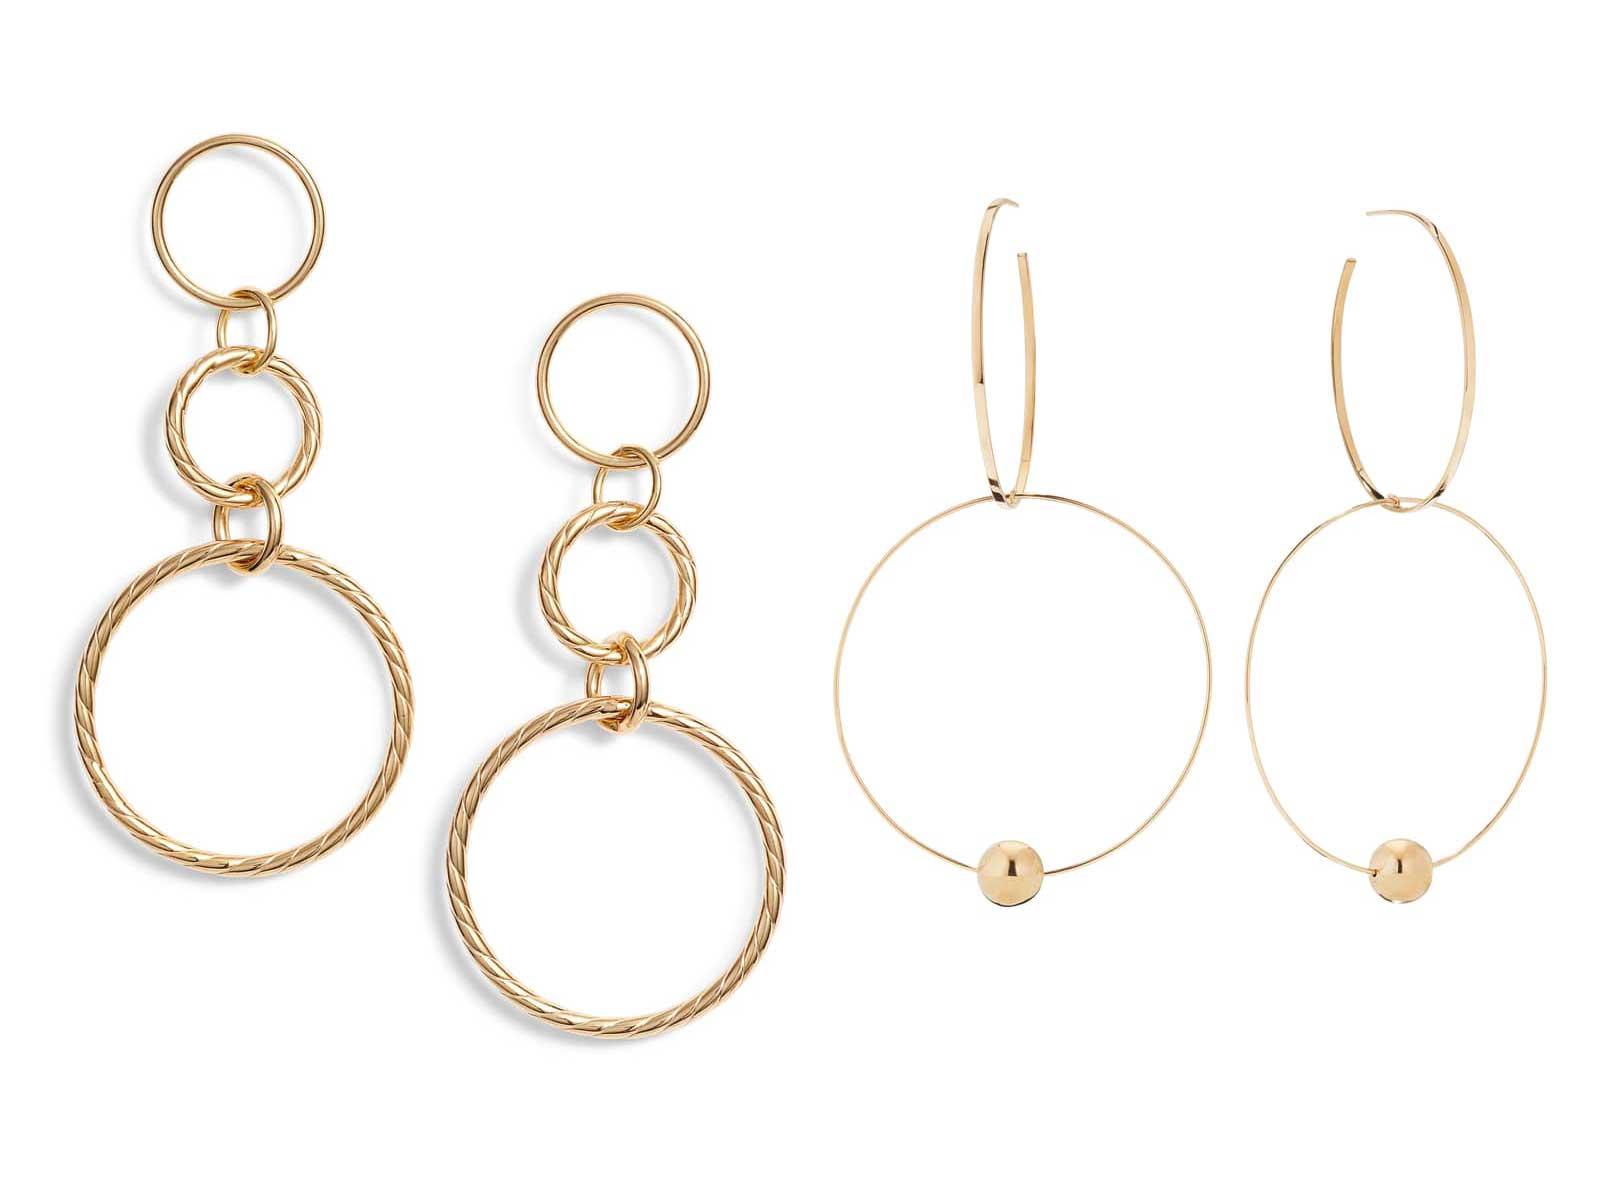 Triple Drop Rope Earrings by Argento Vivo and Bond Link Double Hoop Earrings by Lana Jewelry, Runway Jewelry Trends 2019